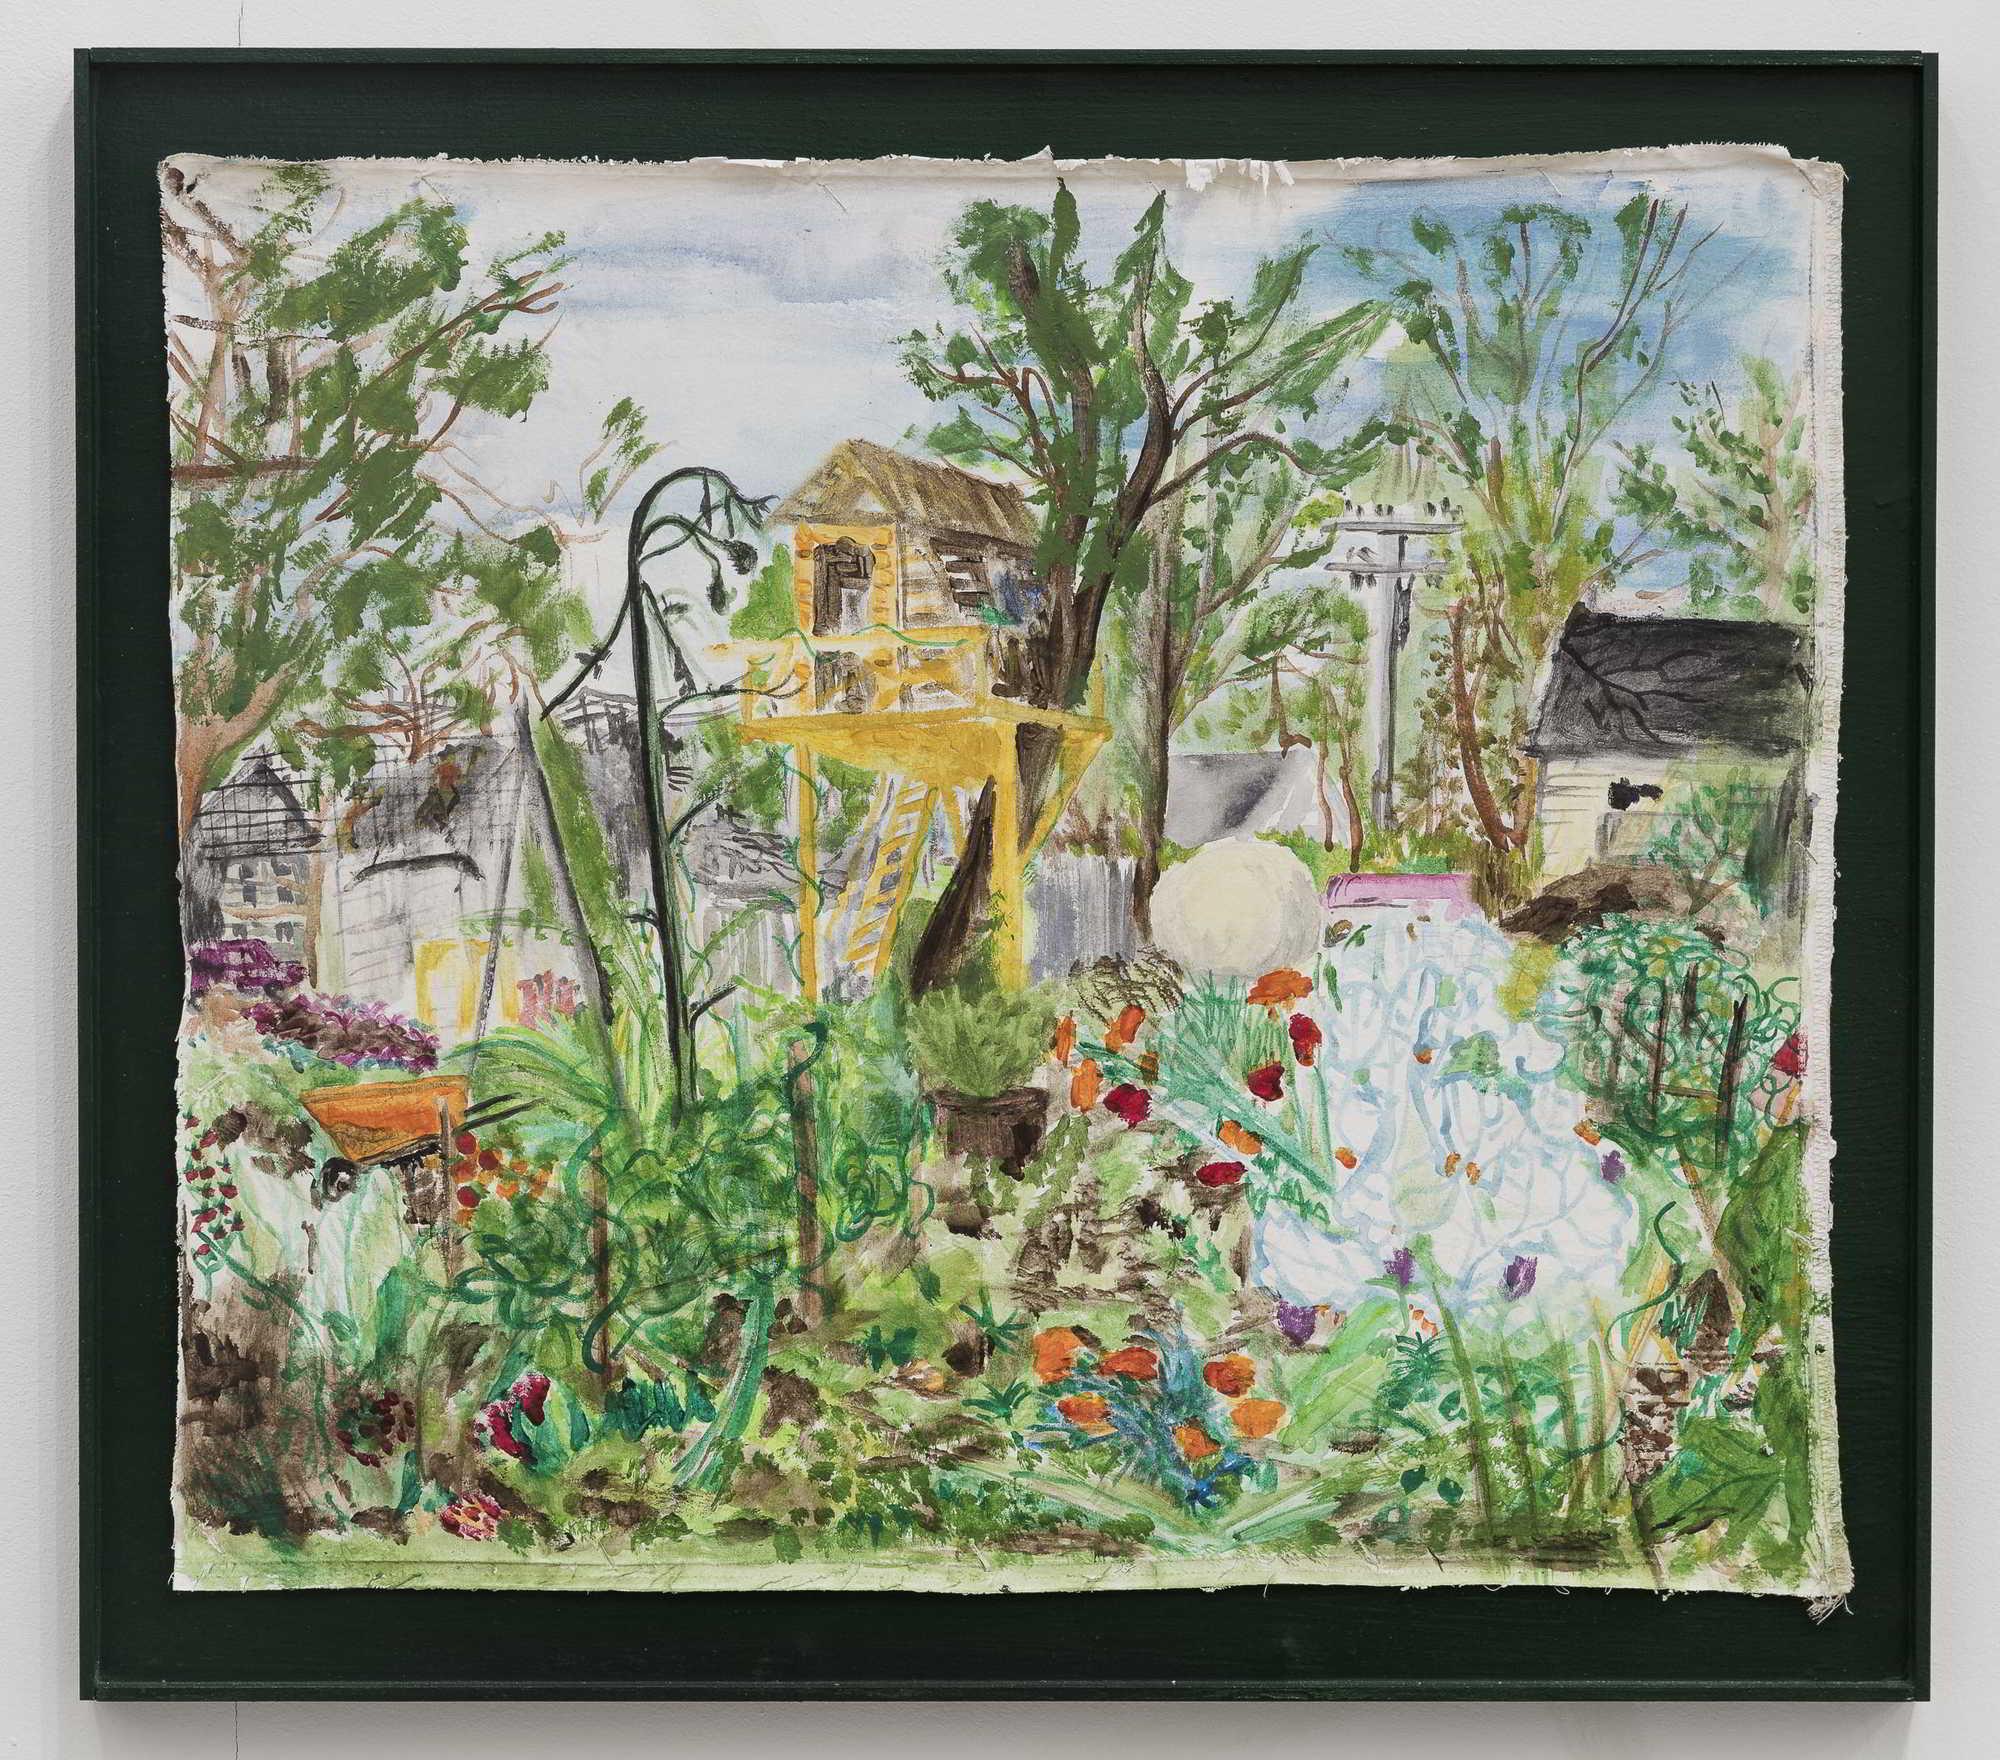 AnnaMcCarthy, Deanu0027s Arm + Garden_Detroit, 2017, Acryl On Fabric In Artists  Frame, 57x64cm